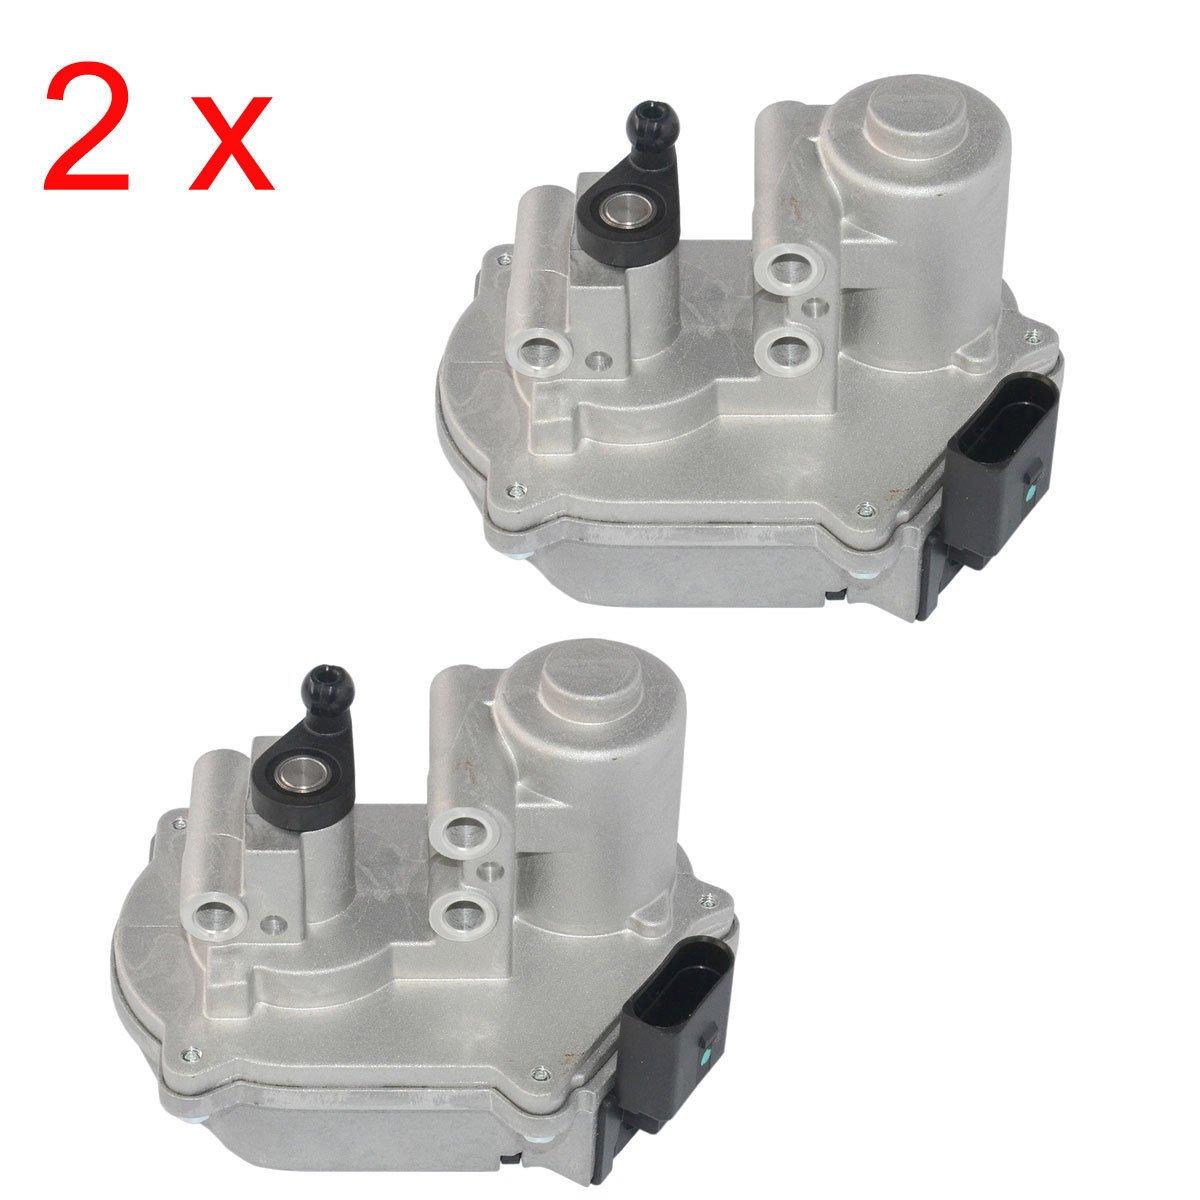 2 PCS Intake Manifold Actuator 4 pins - A2C59513862 / 059129086D AKWH